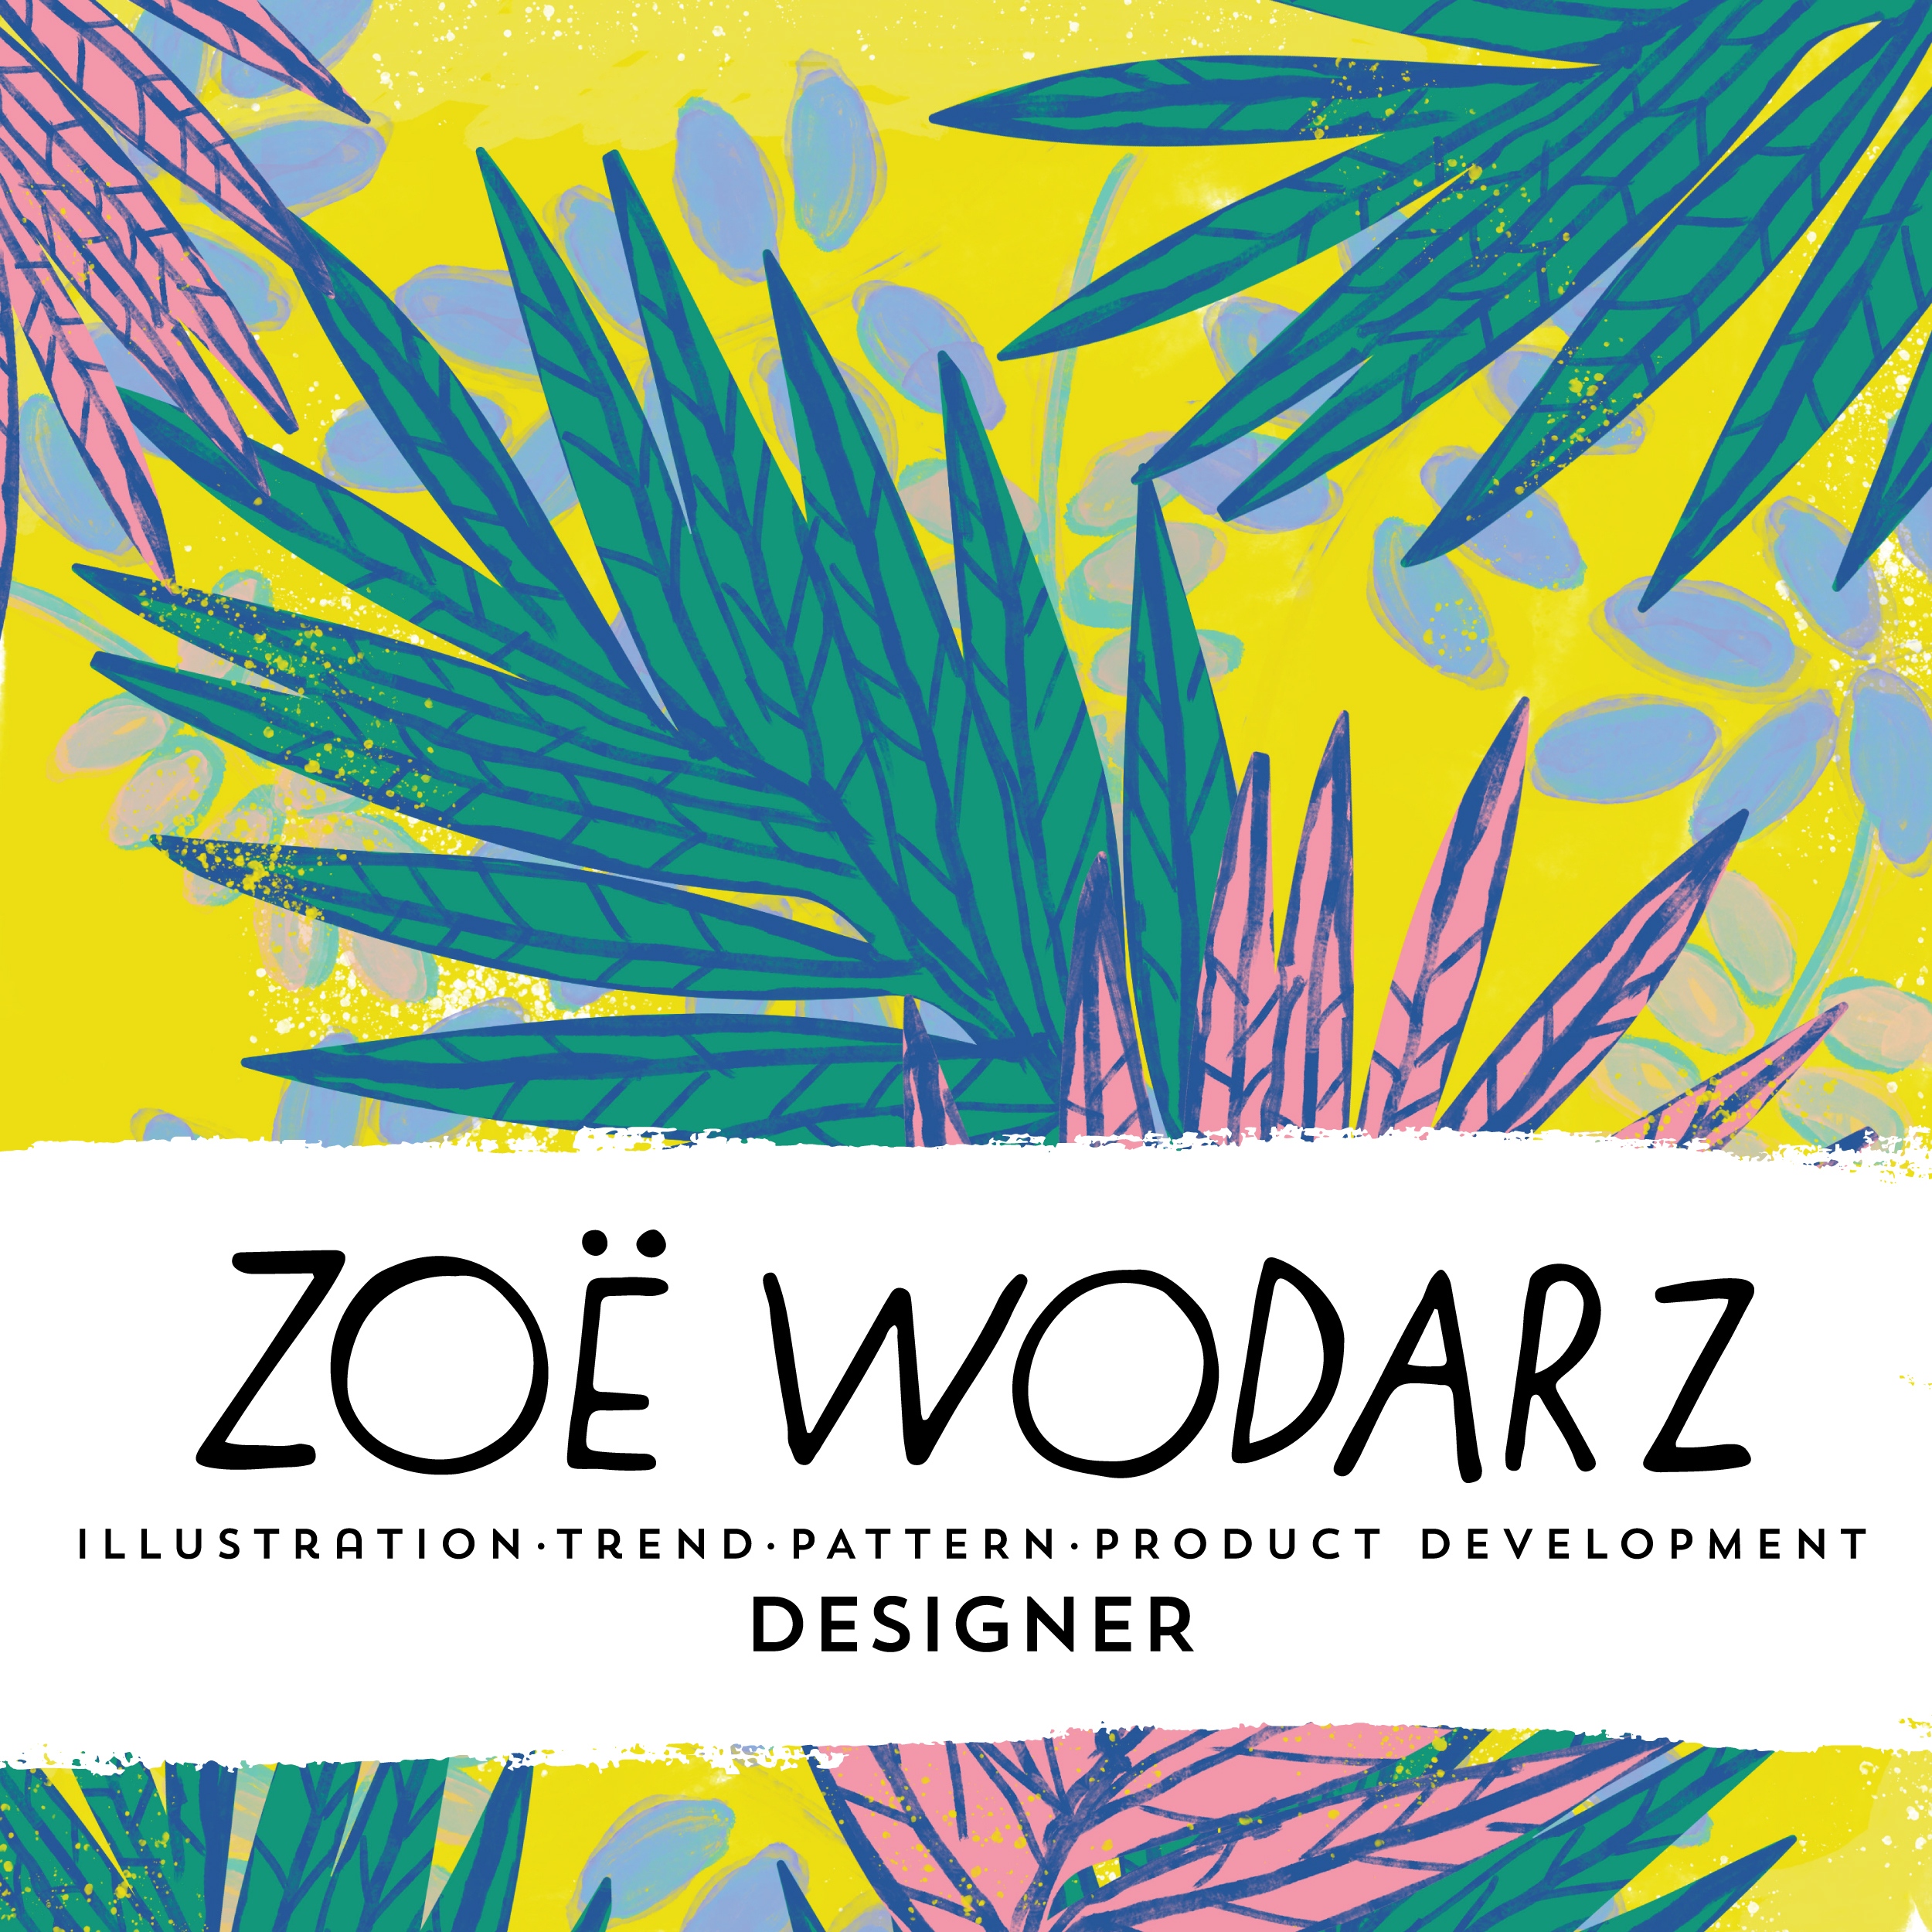 Zoewodarz logo 2016 tdac final v2 01